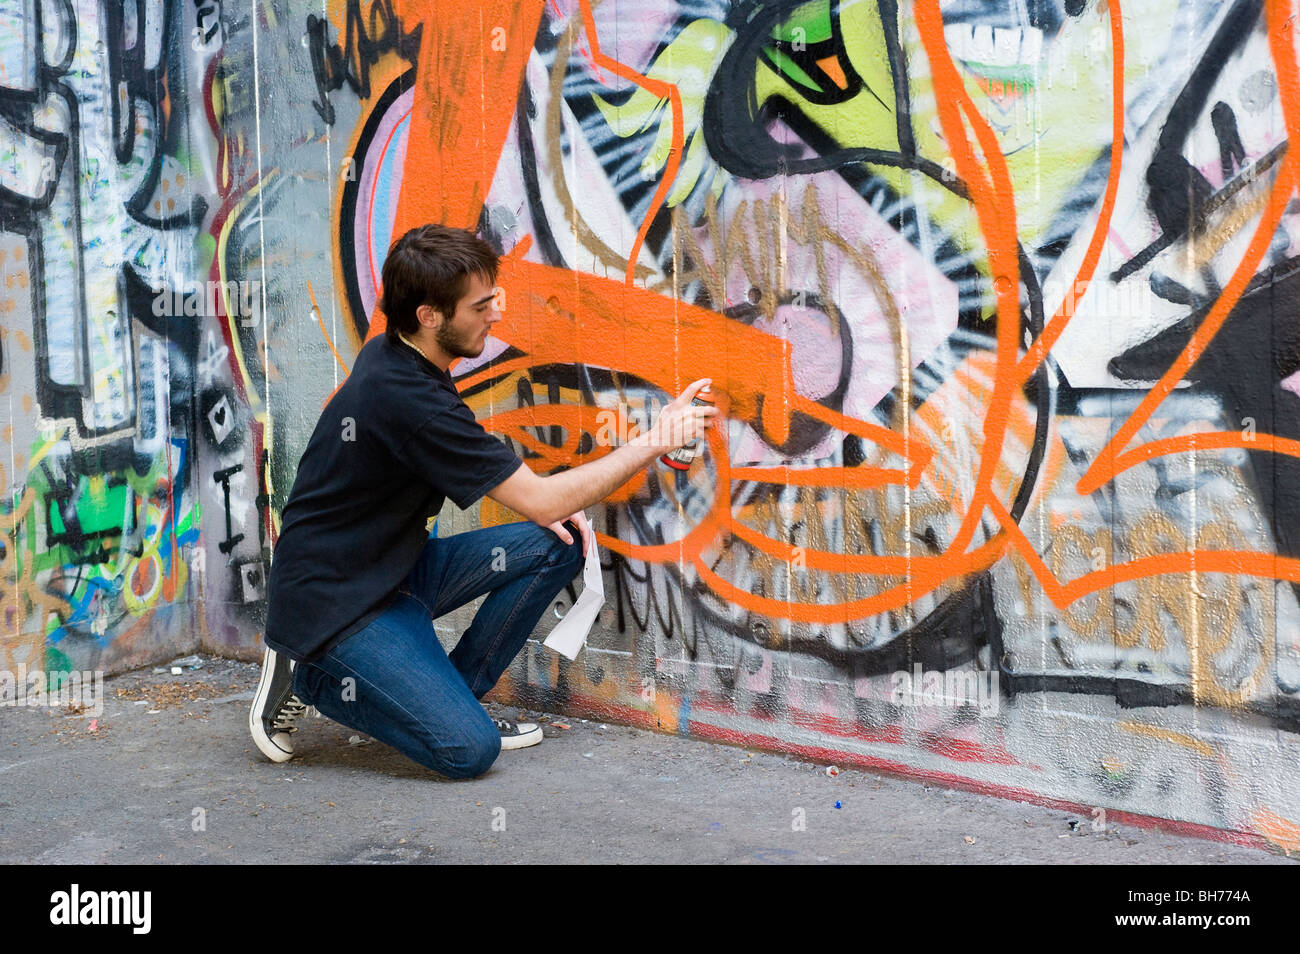 Spray Painting Graffiti On Concrete Wall South Bank London